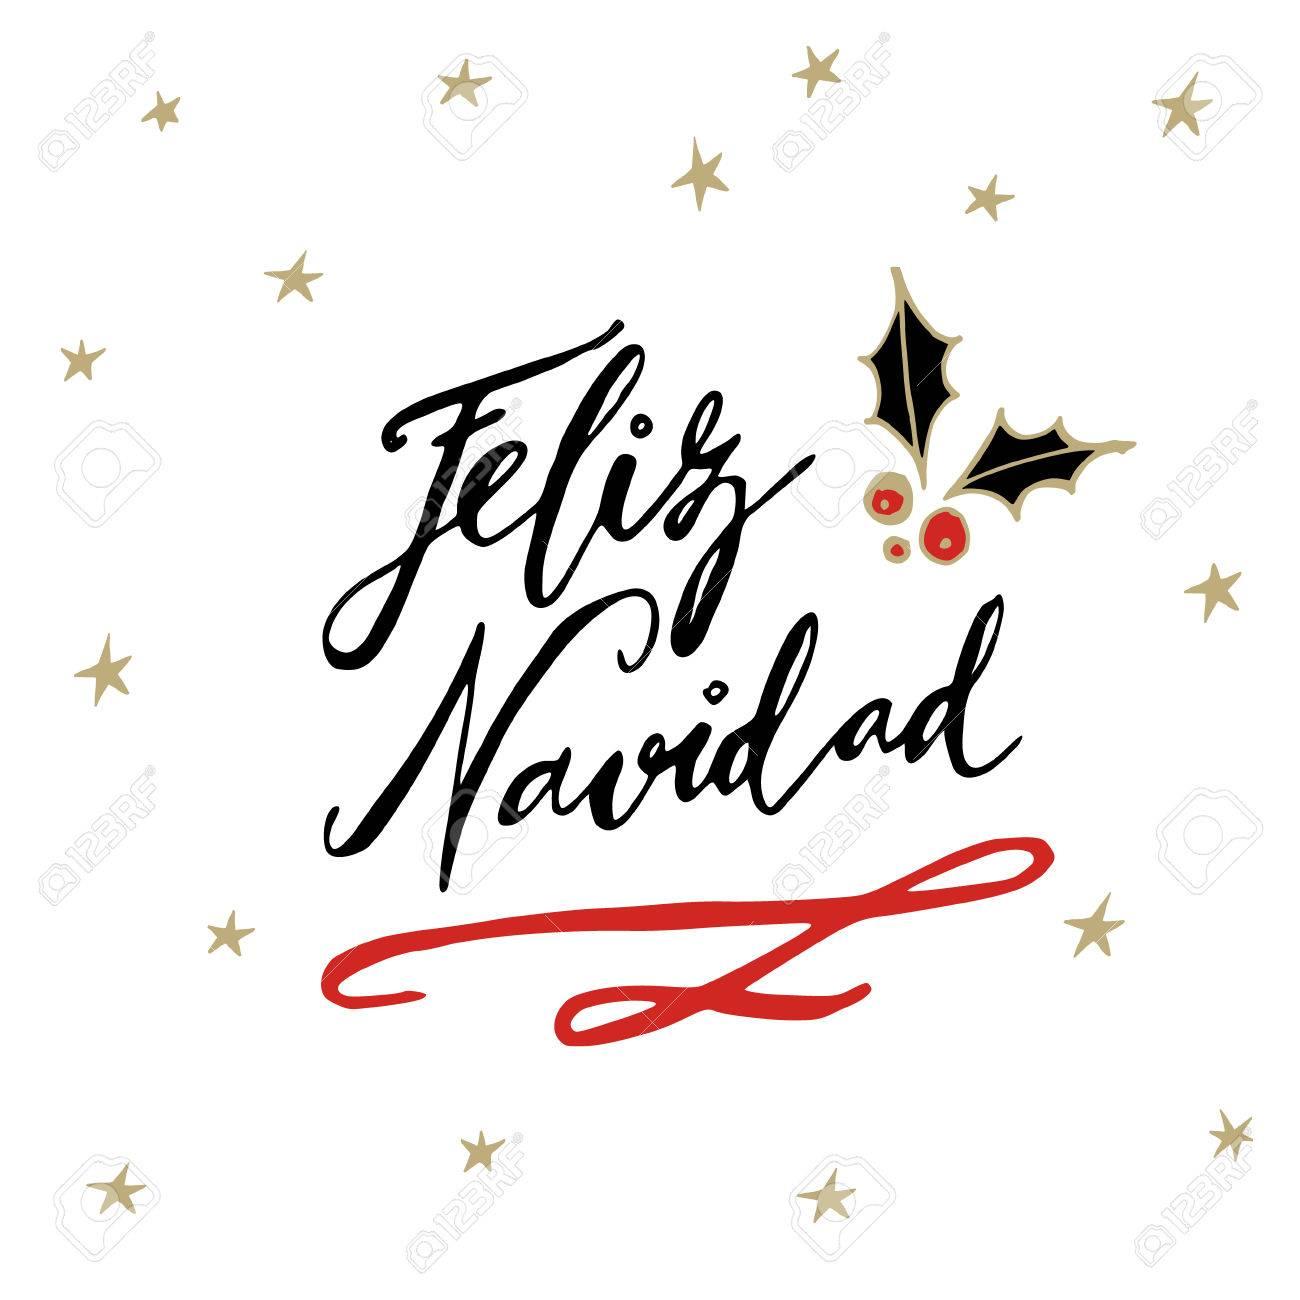 Feliz navidad spanish merry christmas greeting card with feliz navidad spanish merry christmas greeting card with handwritten text and hand drawn holly and m4hsunfo